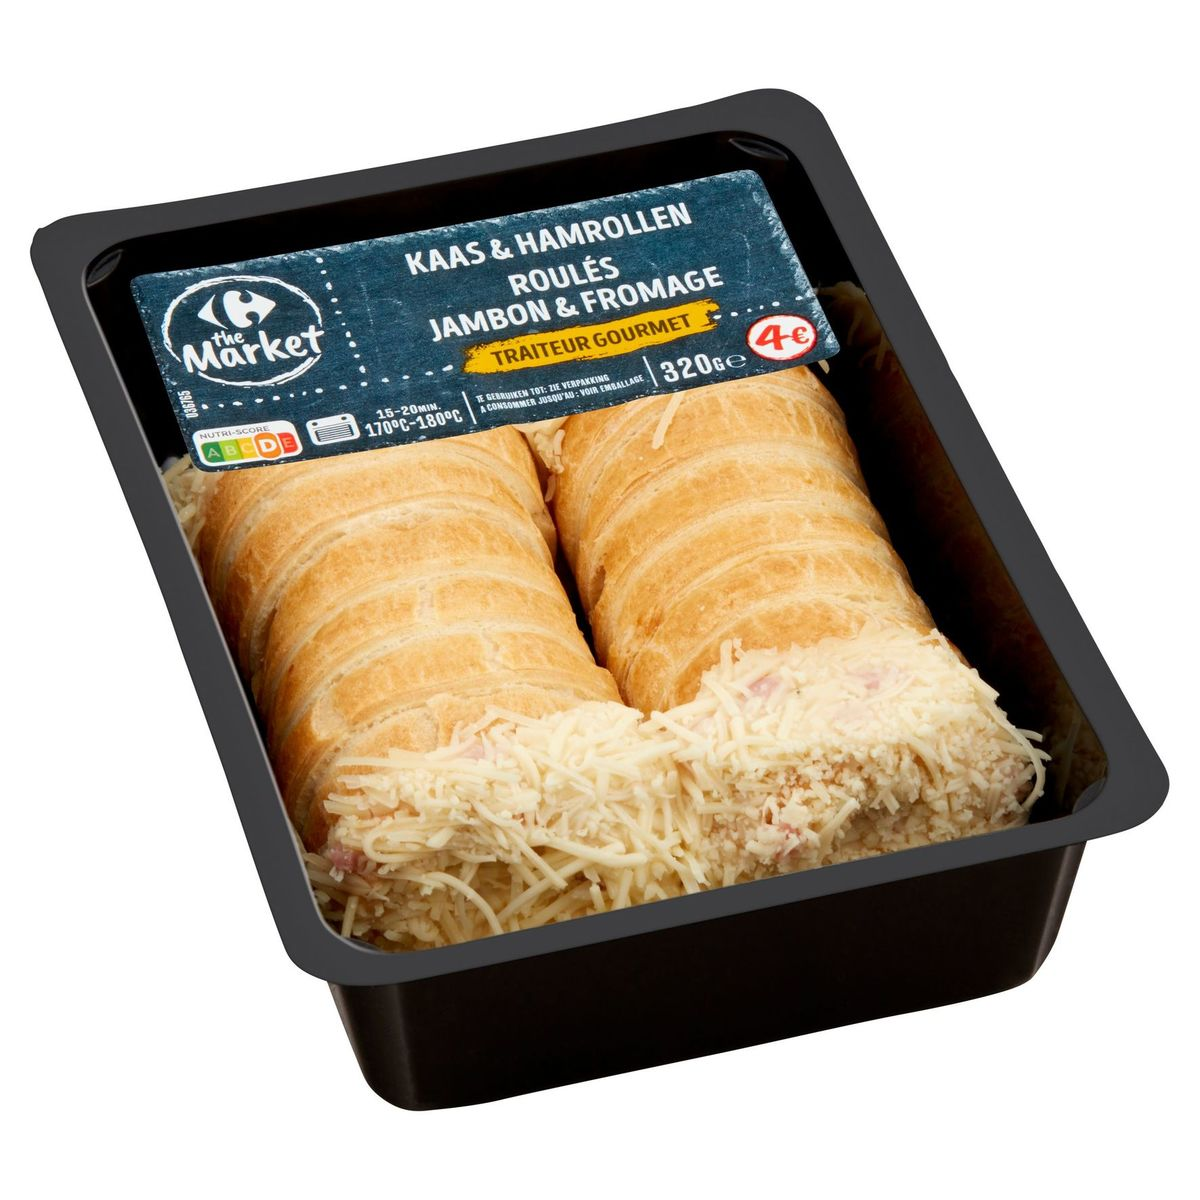 Carrefour Traiteur Gourmet Kaas & Hamrollen 320 g